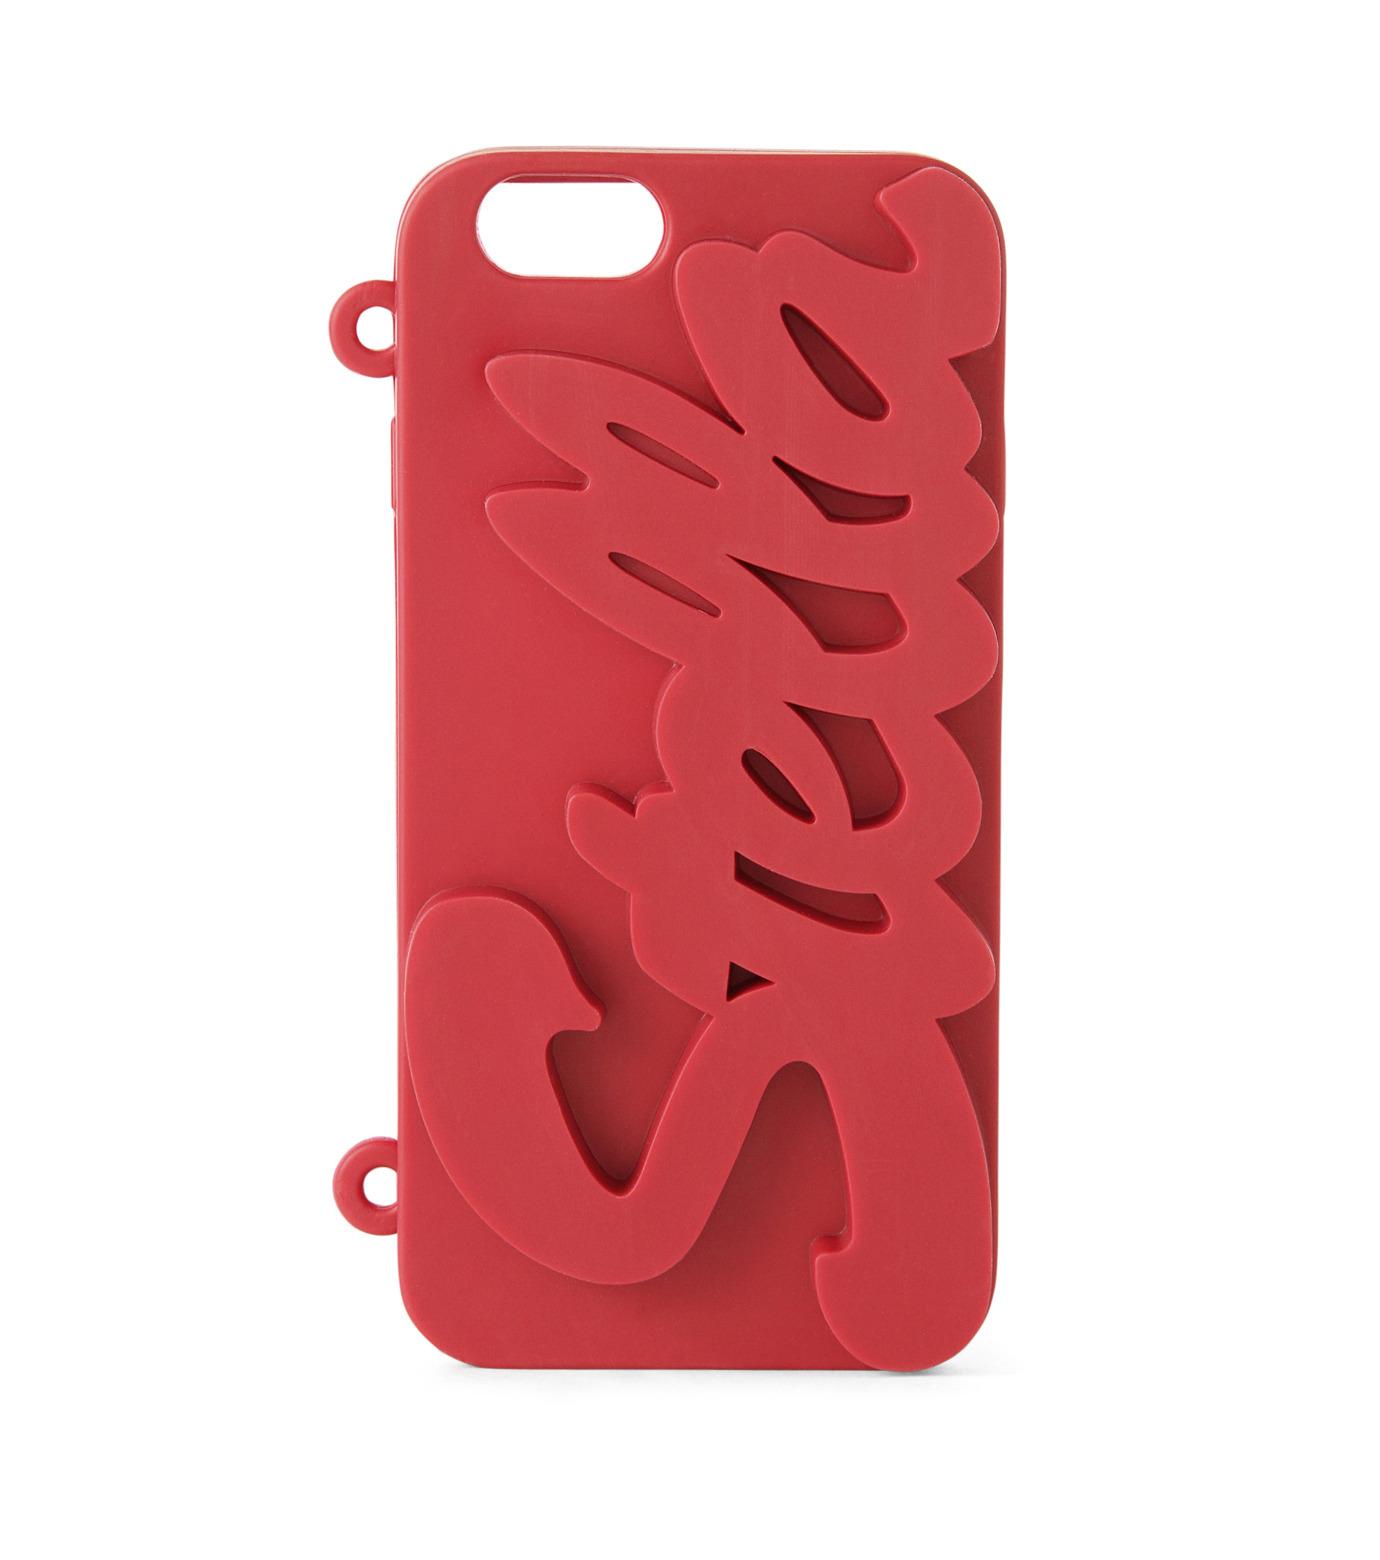 Stella McCartney(ステラマッカートニー)のiPhone6 Case Stella-PINK(ケースiphone6/6s/case iphone6/6s)-397935-W9589-72 拡大詳細画像1